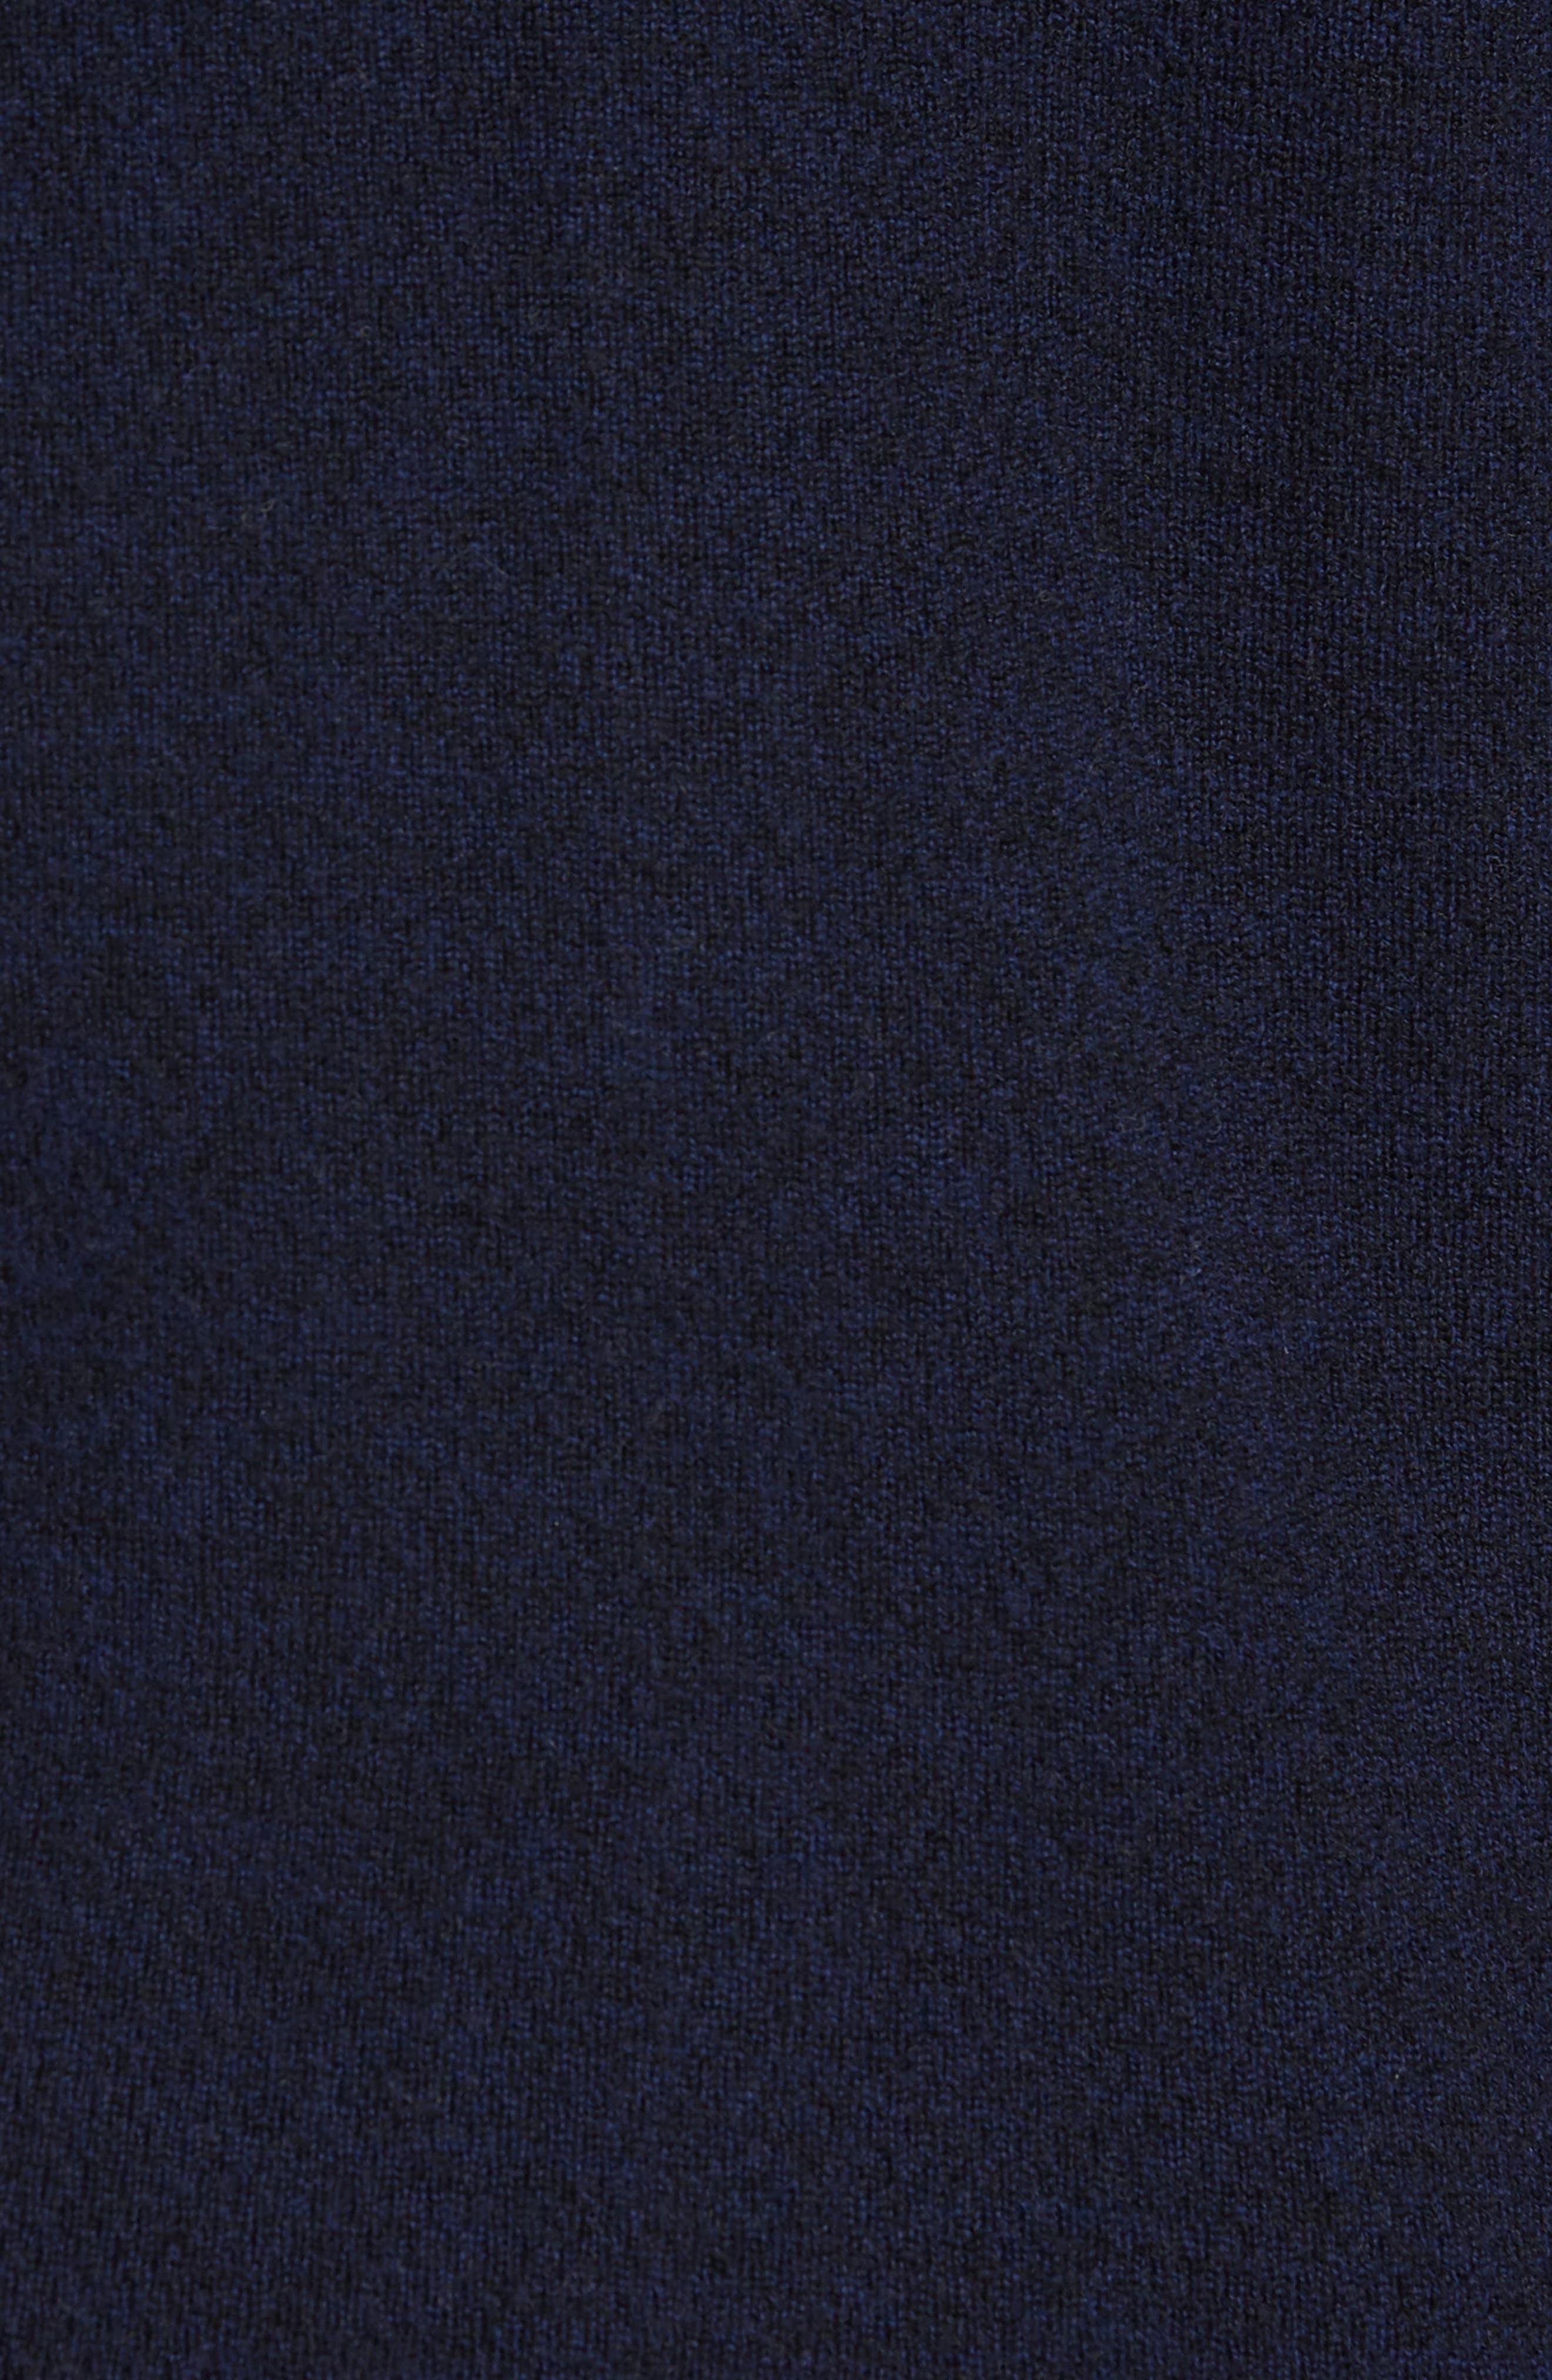 Gregory Wool Blend Cardigan,                             Alternate thumbnail 5, color,                             Navy Melange